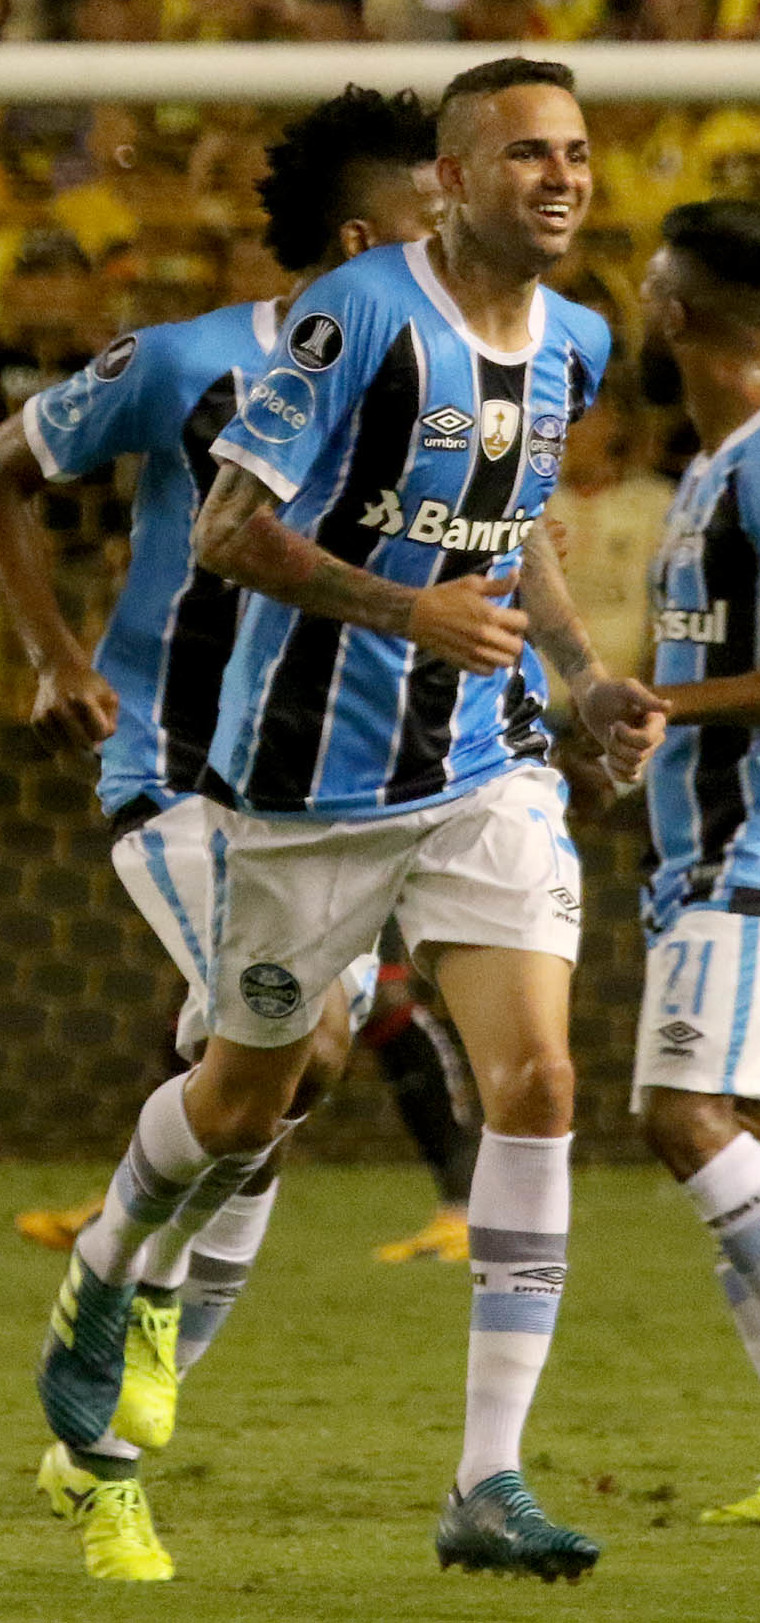 Grêmio Foot-Ball Porto Alegrense – Wikipédia 80d5bc1d11800